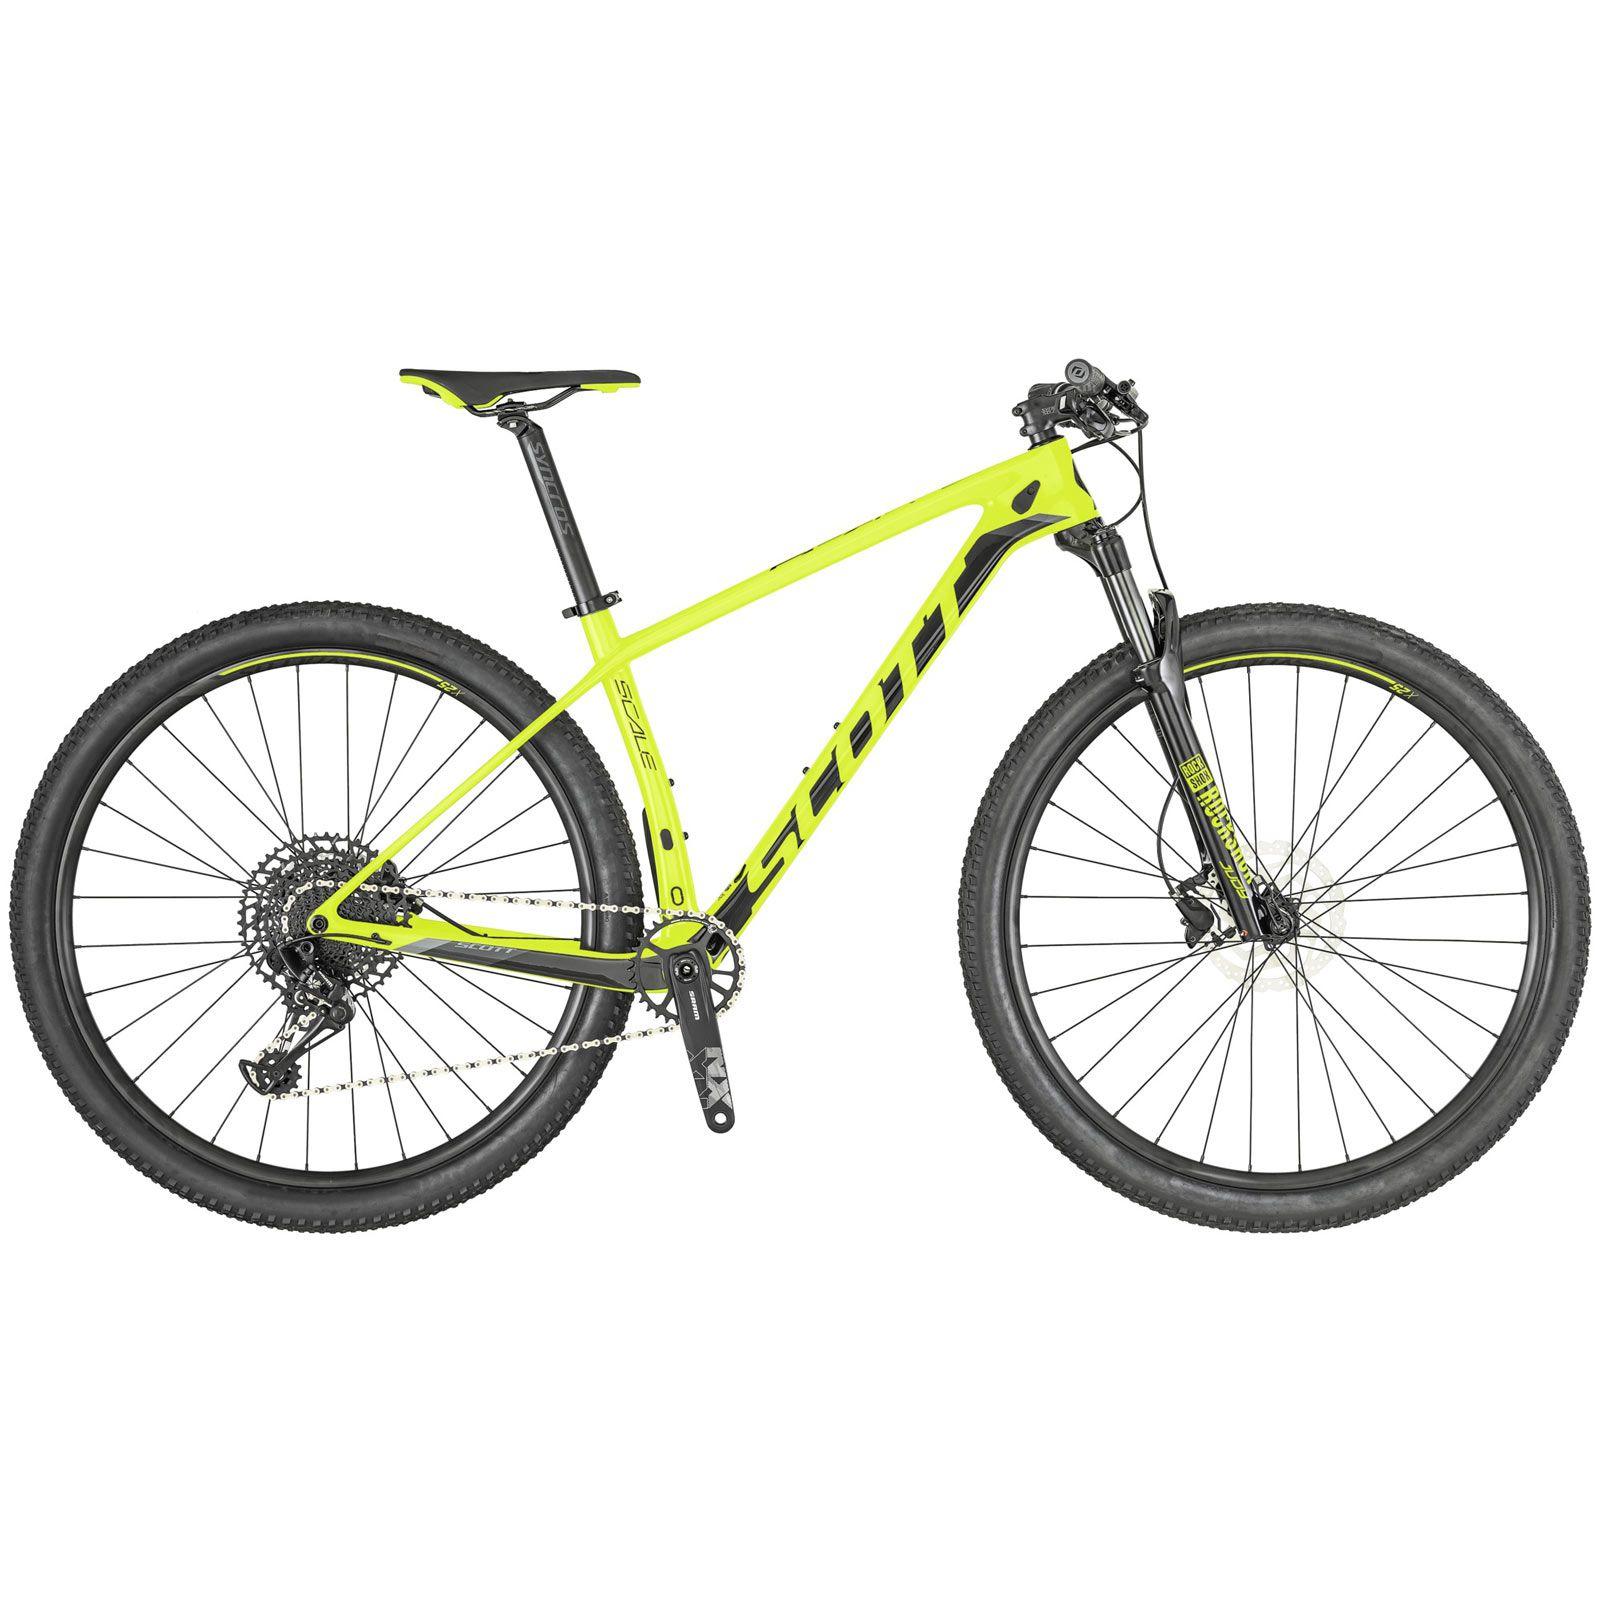 Bicicleta Scott Scale 940 Aro 29